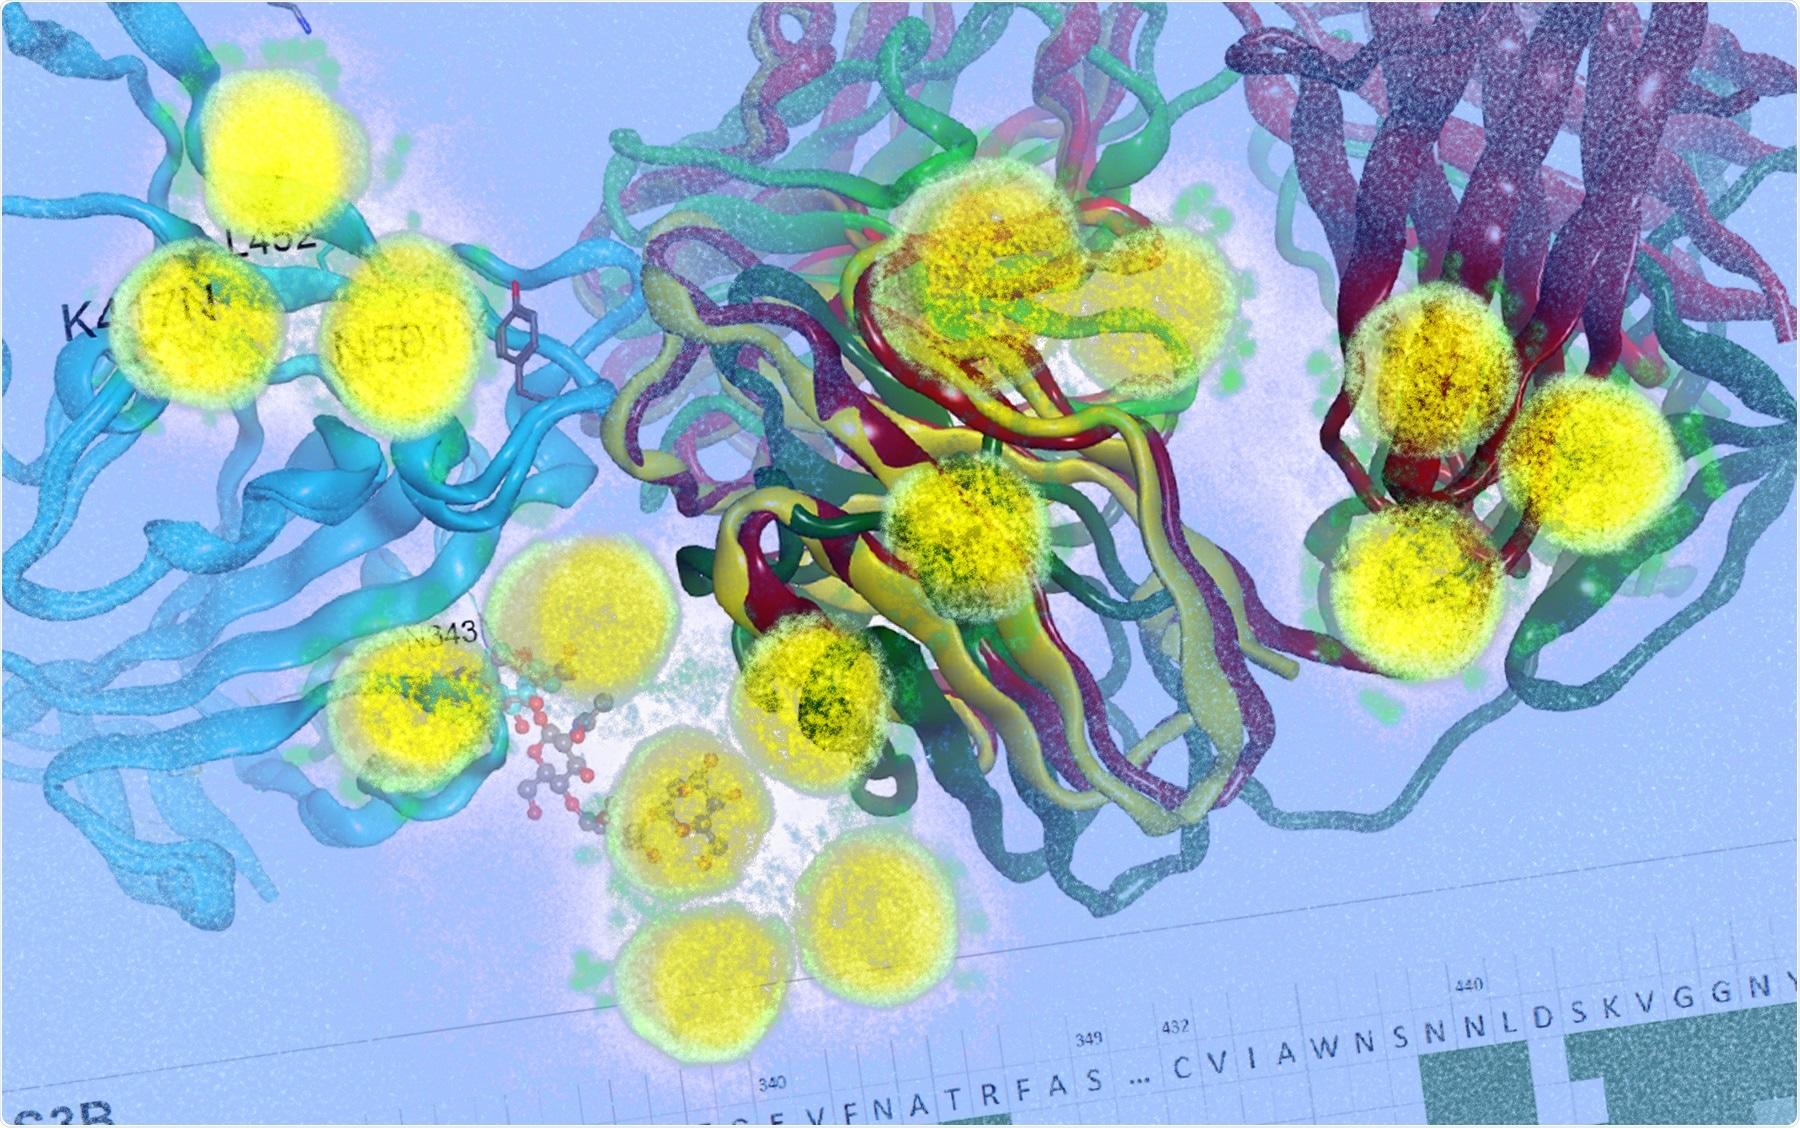 Study: LY-CoV1404 potently neutralizes SARS-CoV-2 variants. Image Credit: NIAID